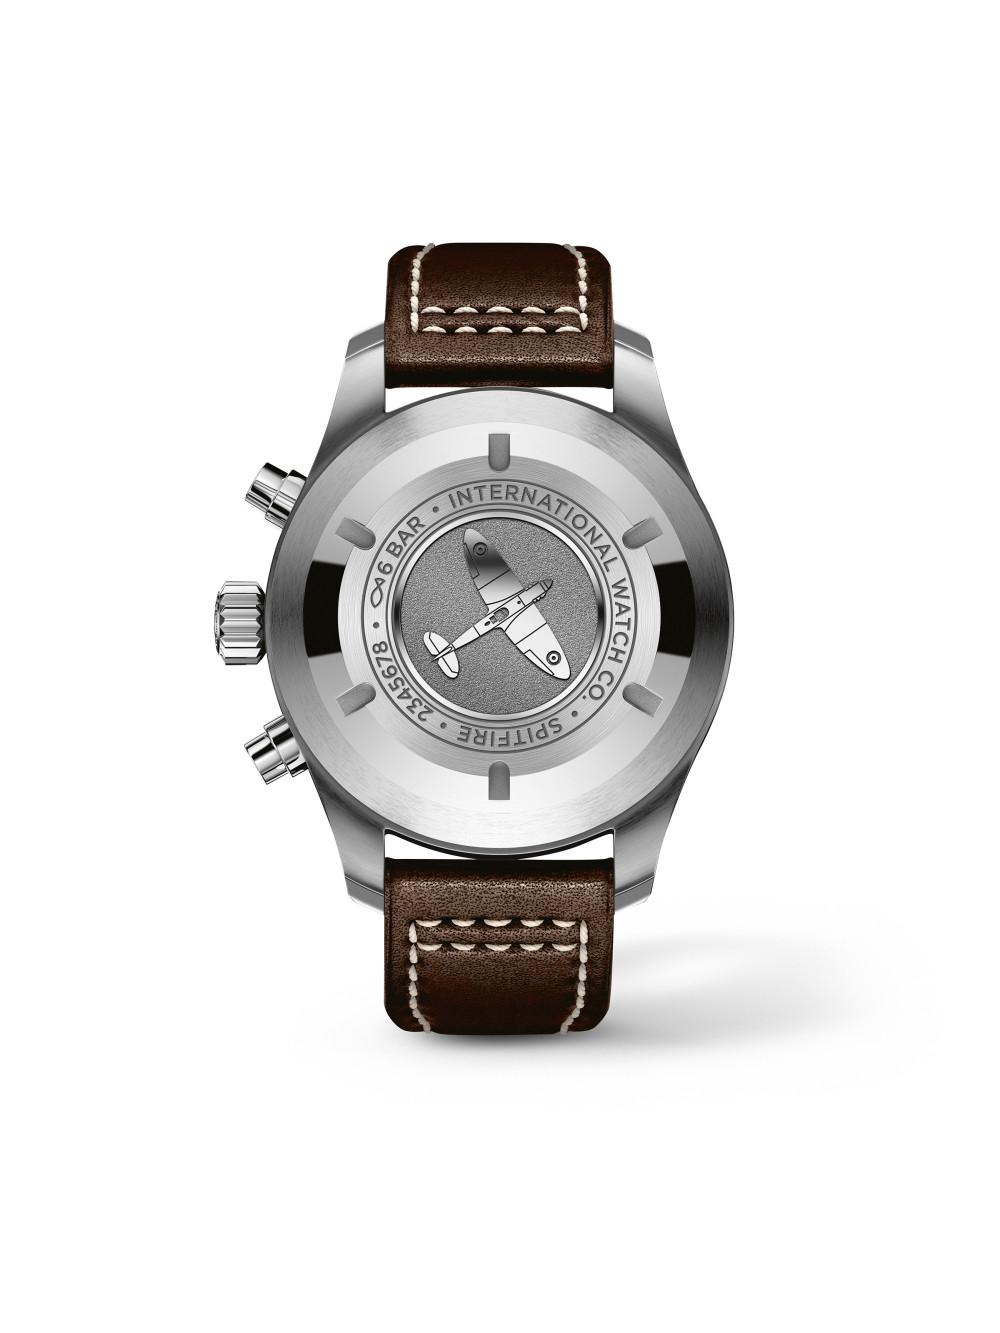 Pilot's Watch Chronograph Spitfire 02